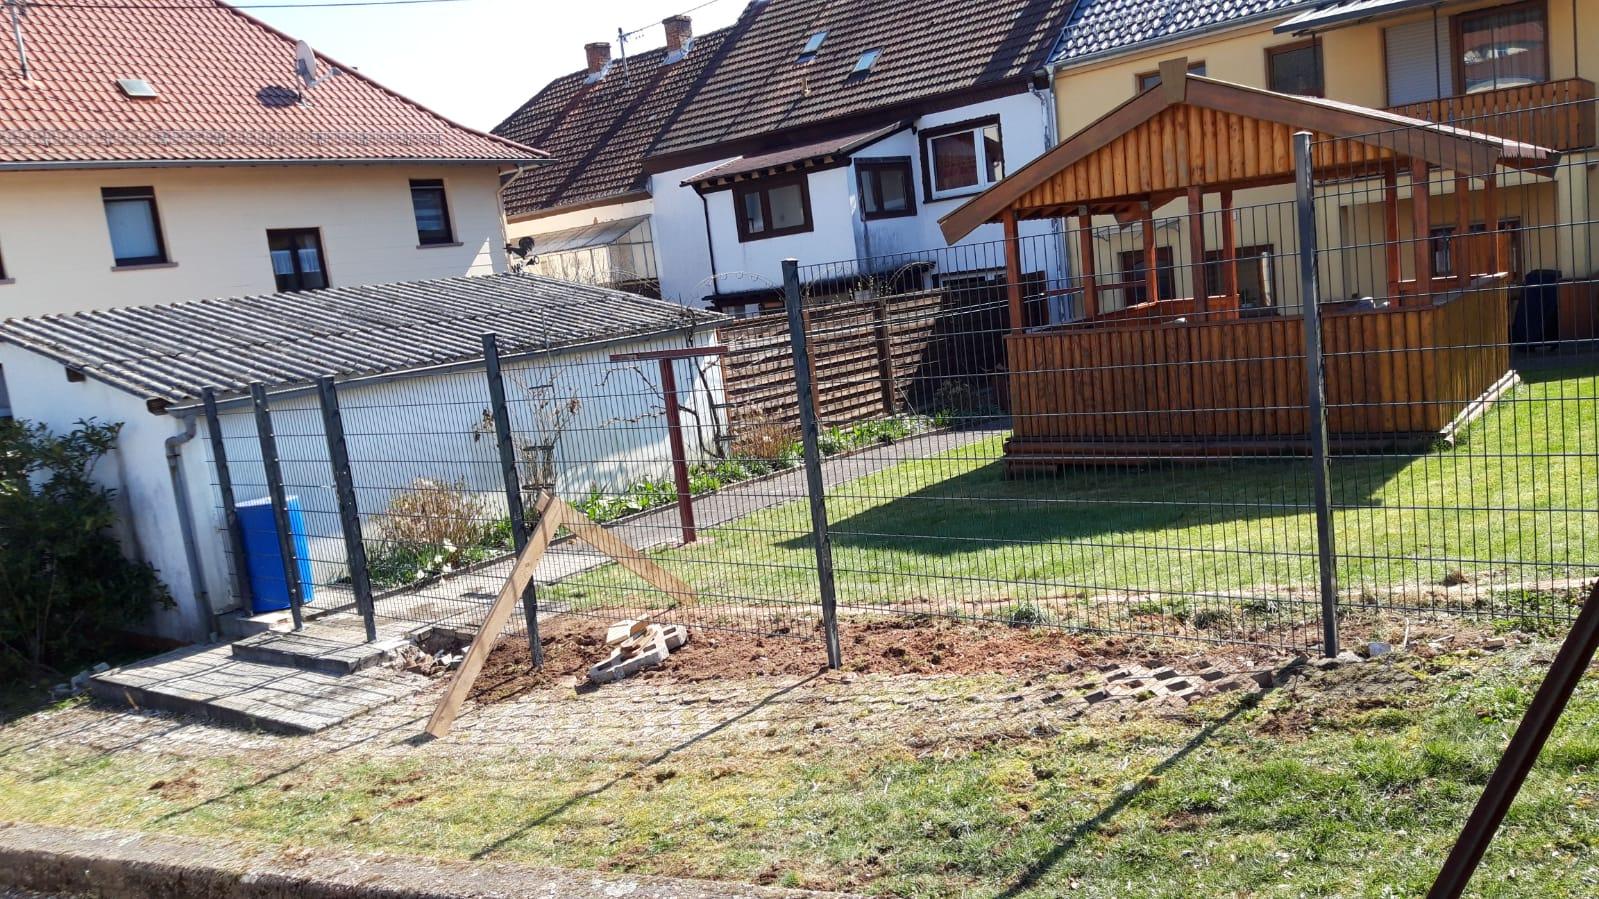 Zaunbau mit Windschutz